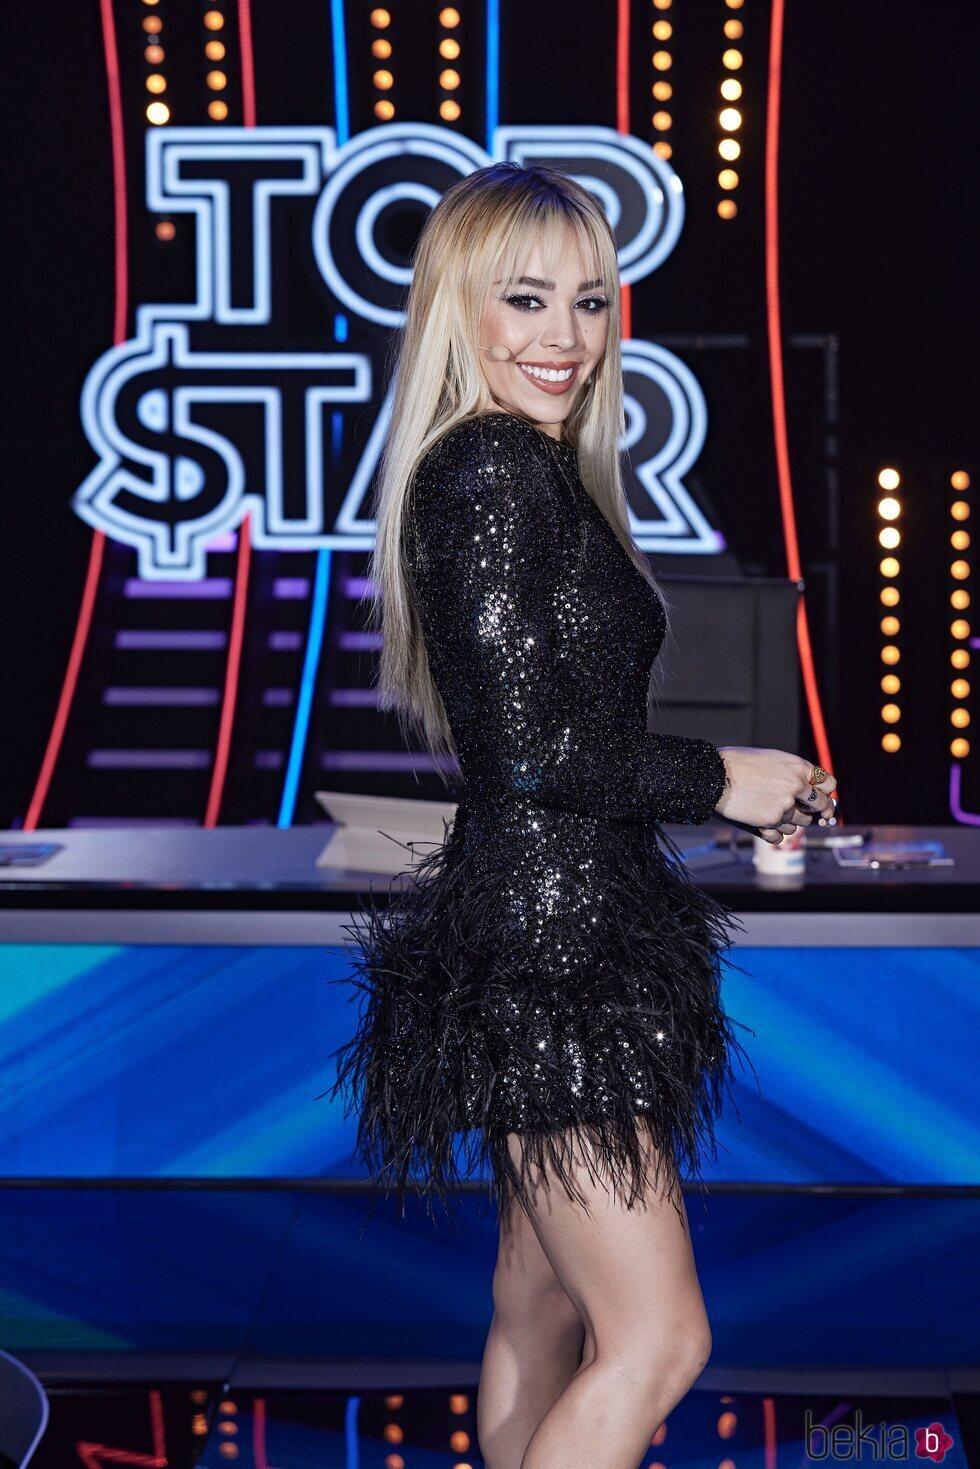 Danna Paola en el tercer programa de 'Top Star'